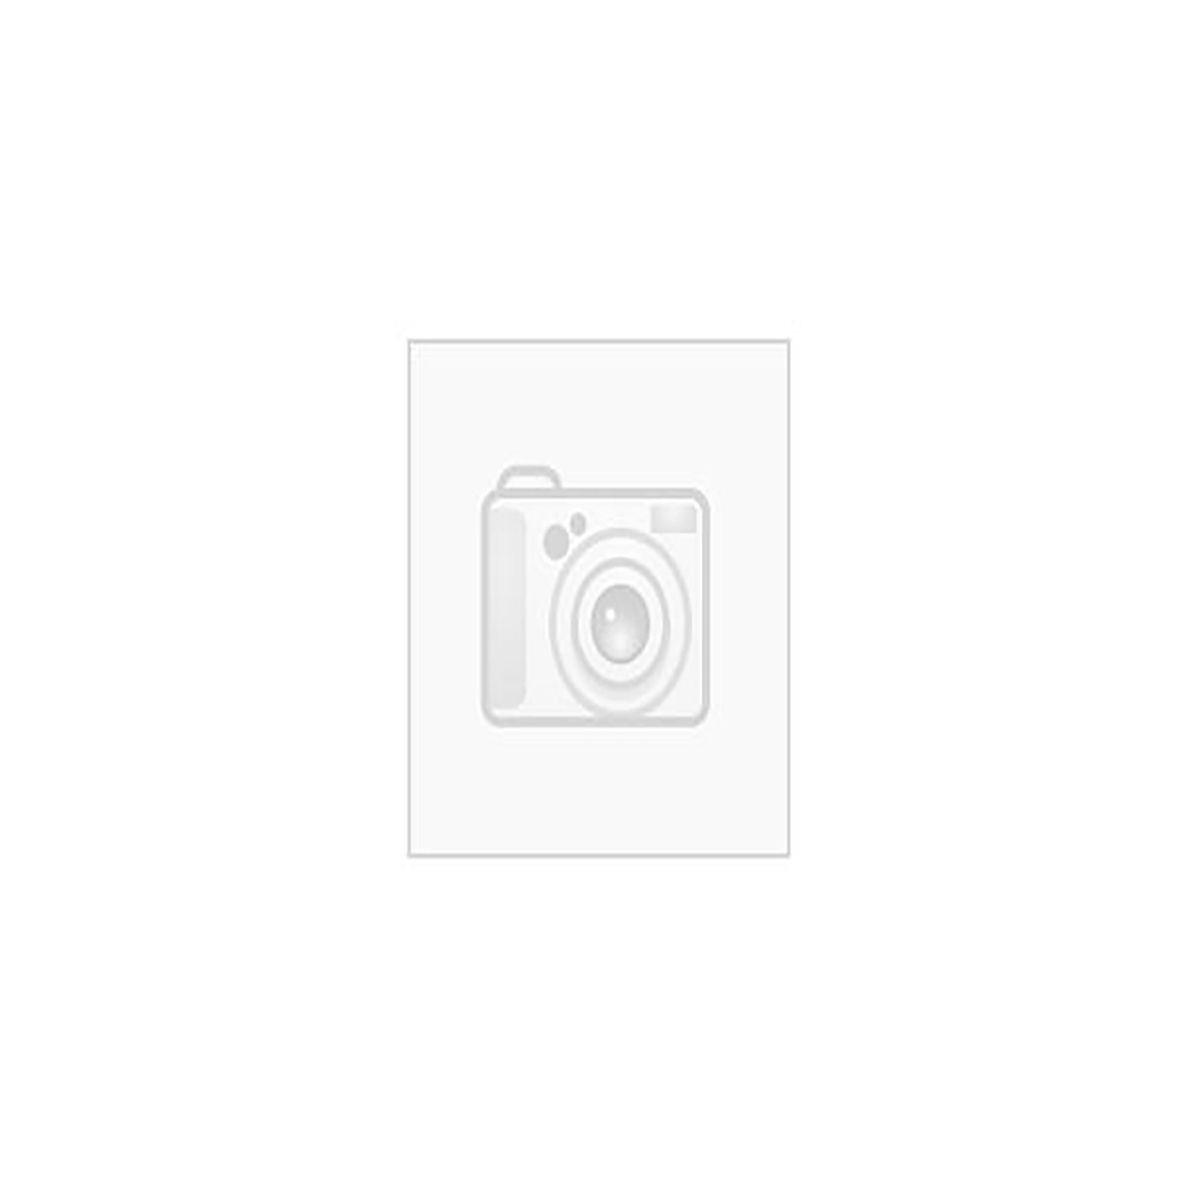 NT slukrist Capri syrefast 316 stål 20x20